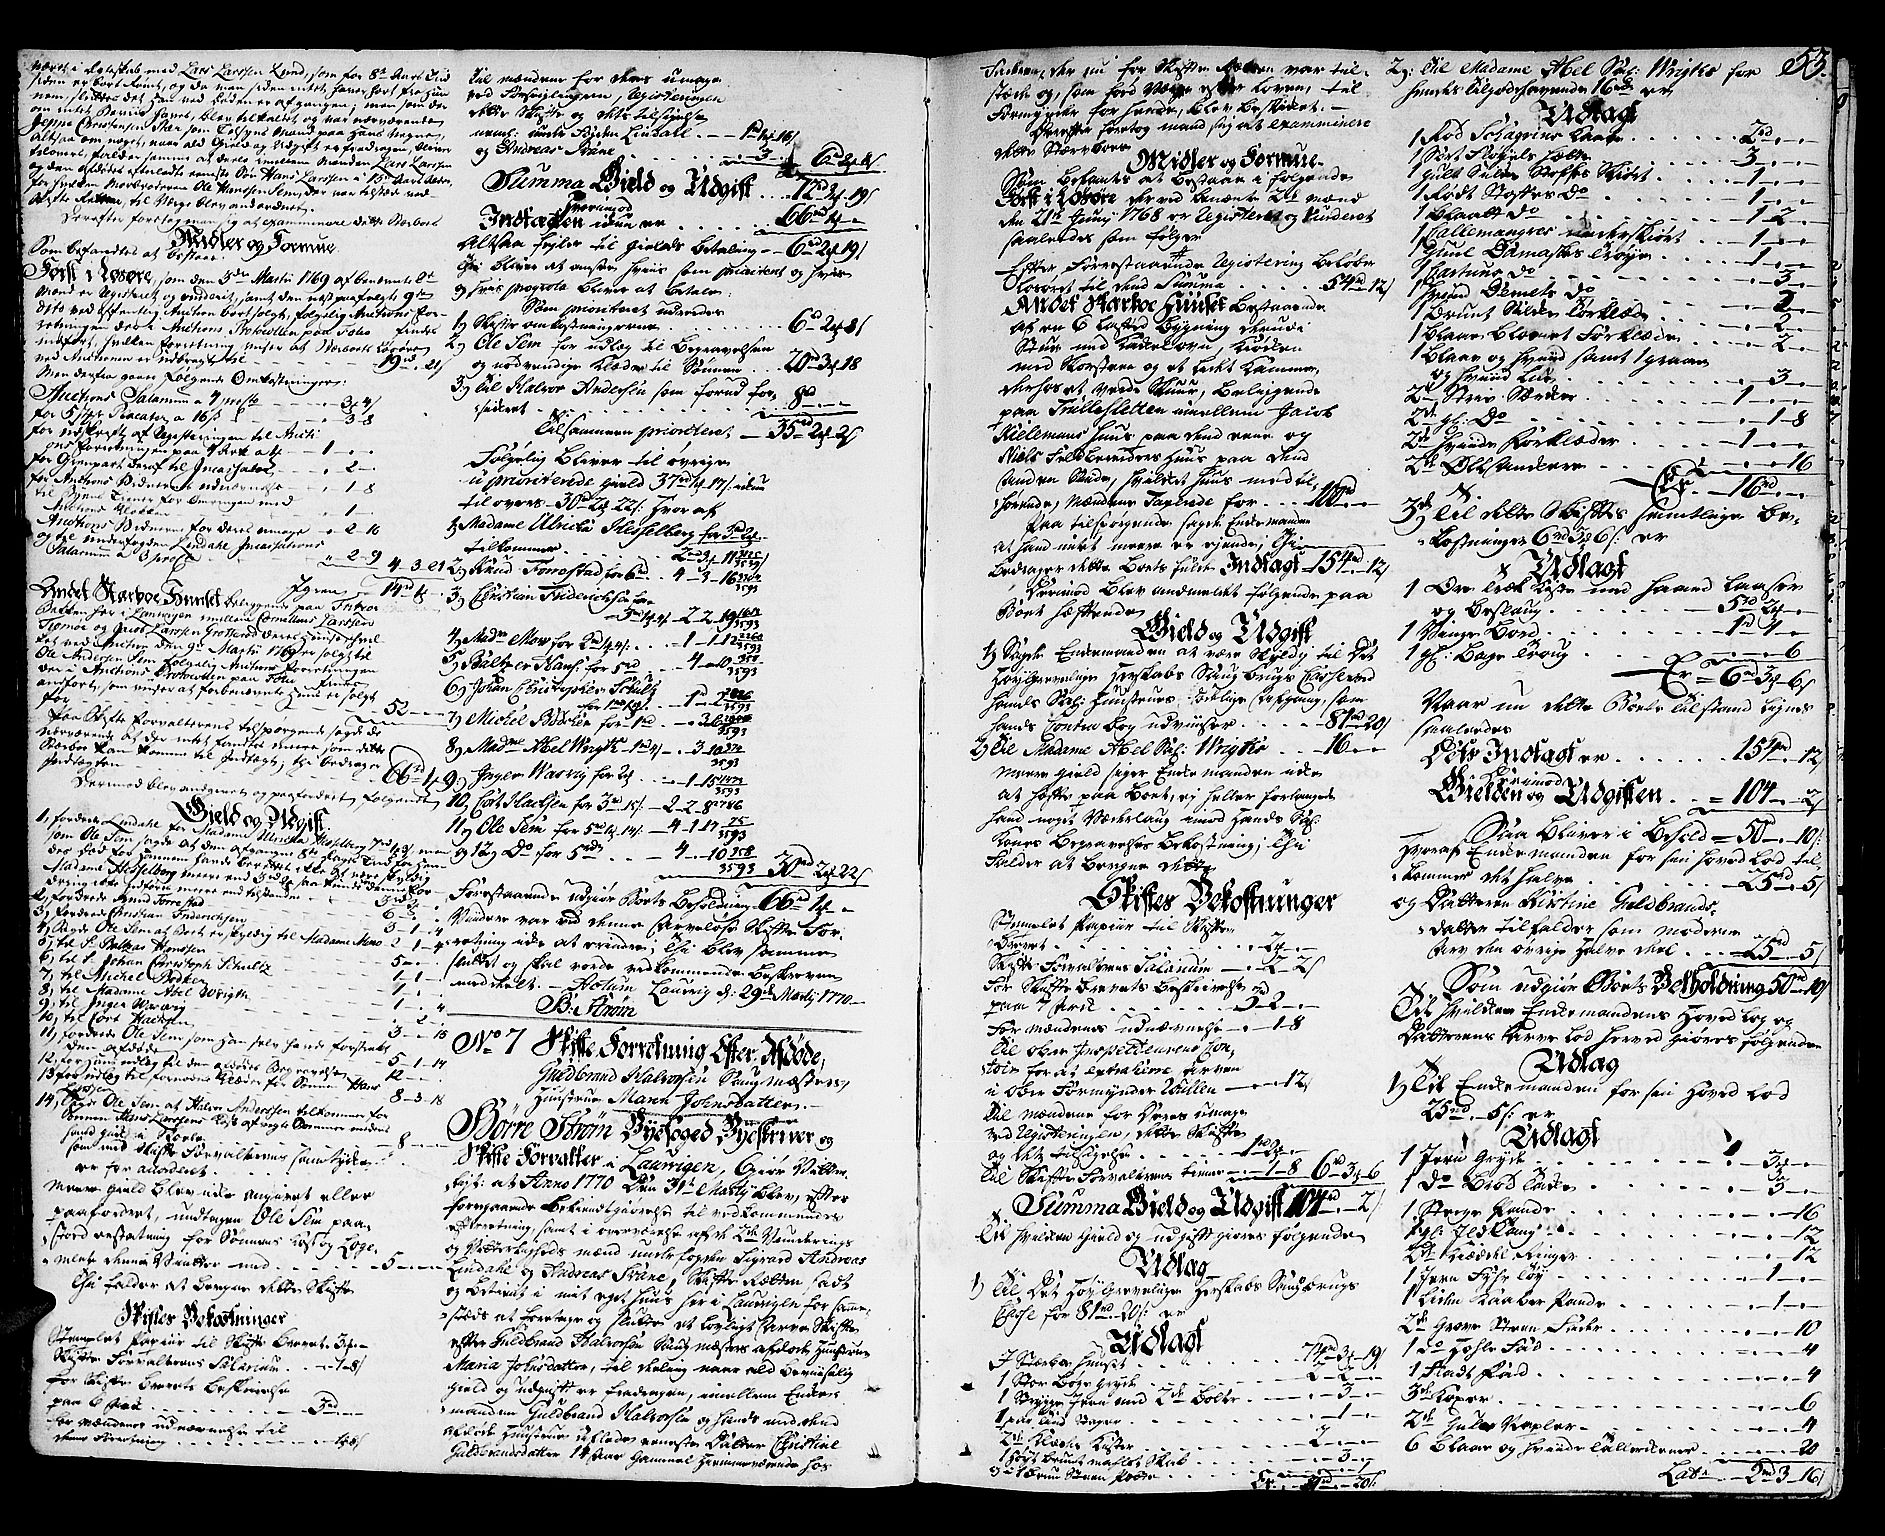 SAKO, Larvik byfogd, H/Hb/Hba/L0010: Skifteprotokoll., 1765-1792, s. 52b-53a